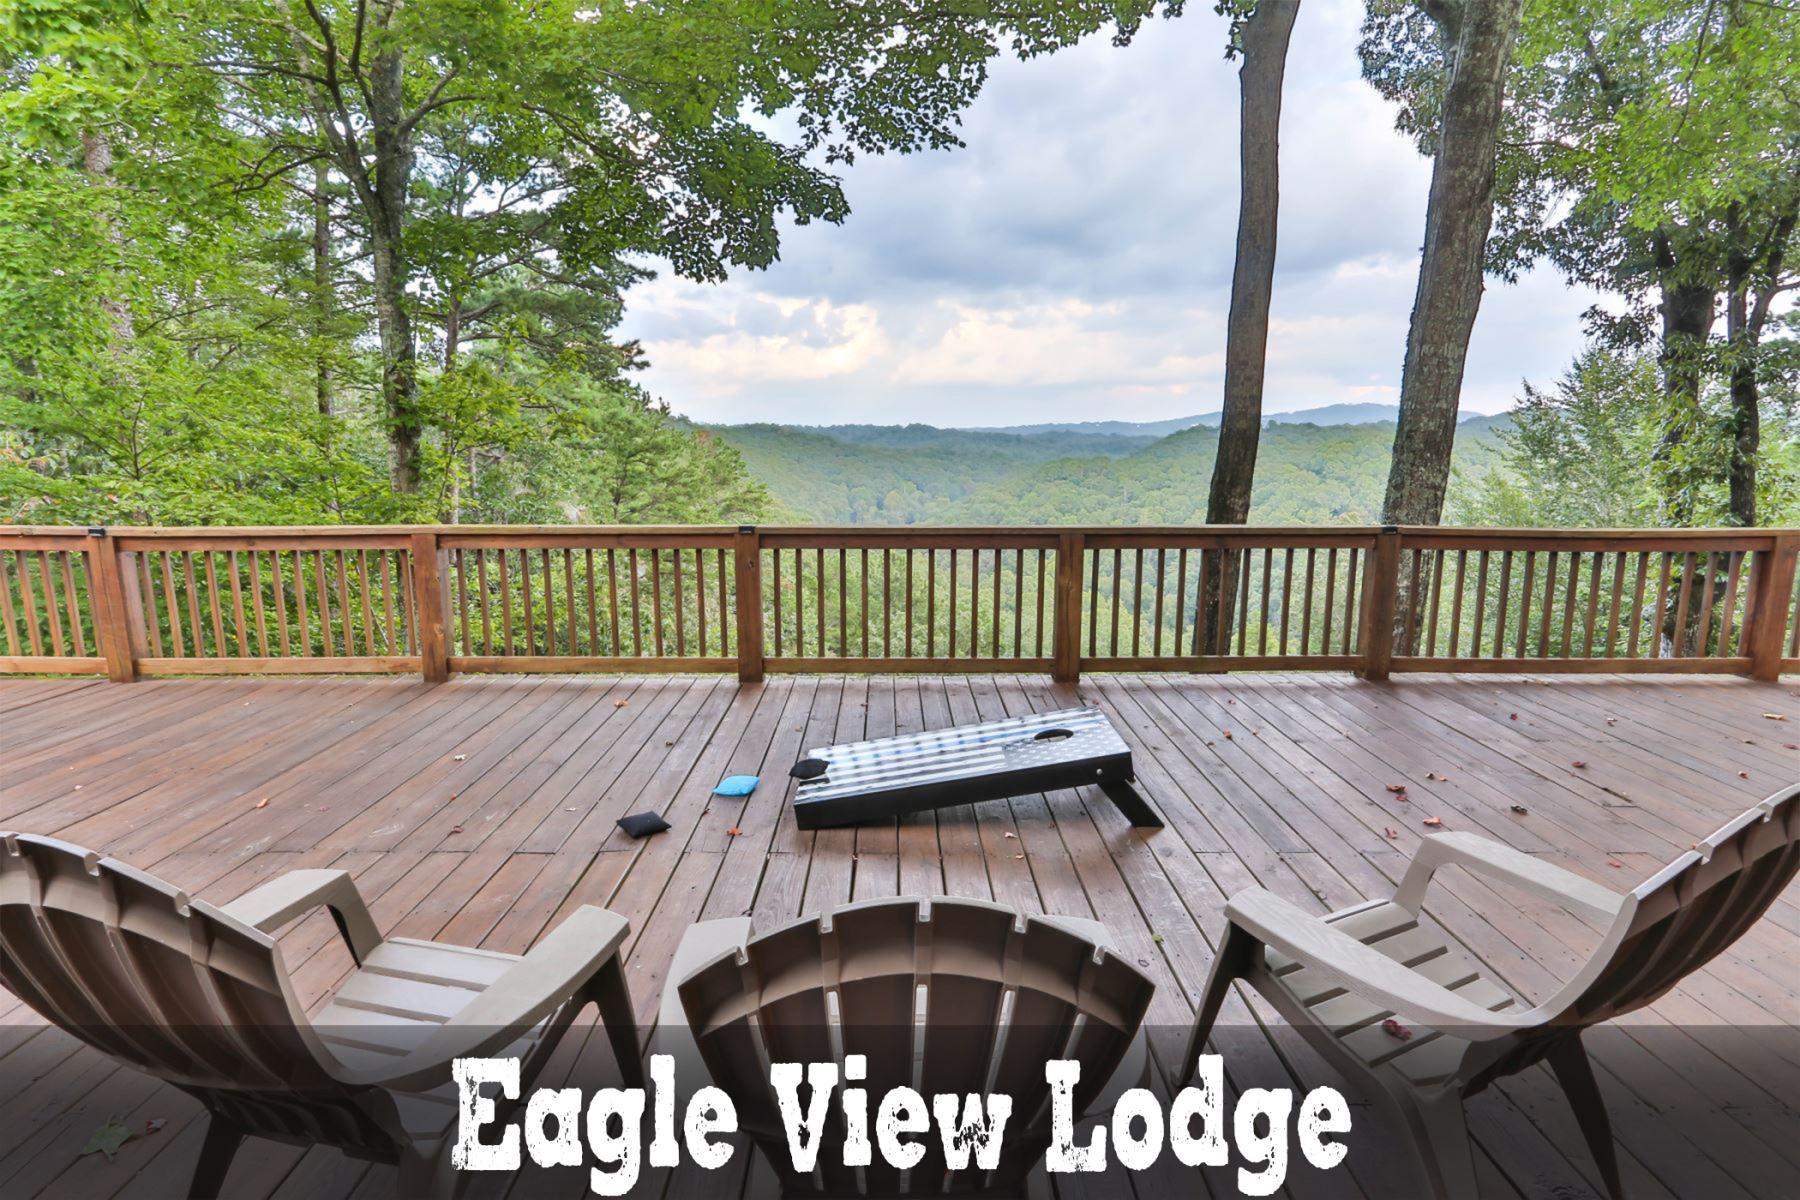 Eagle View Lodge